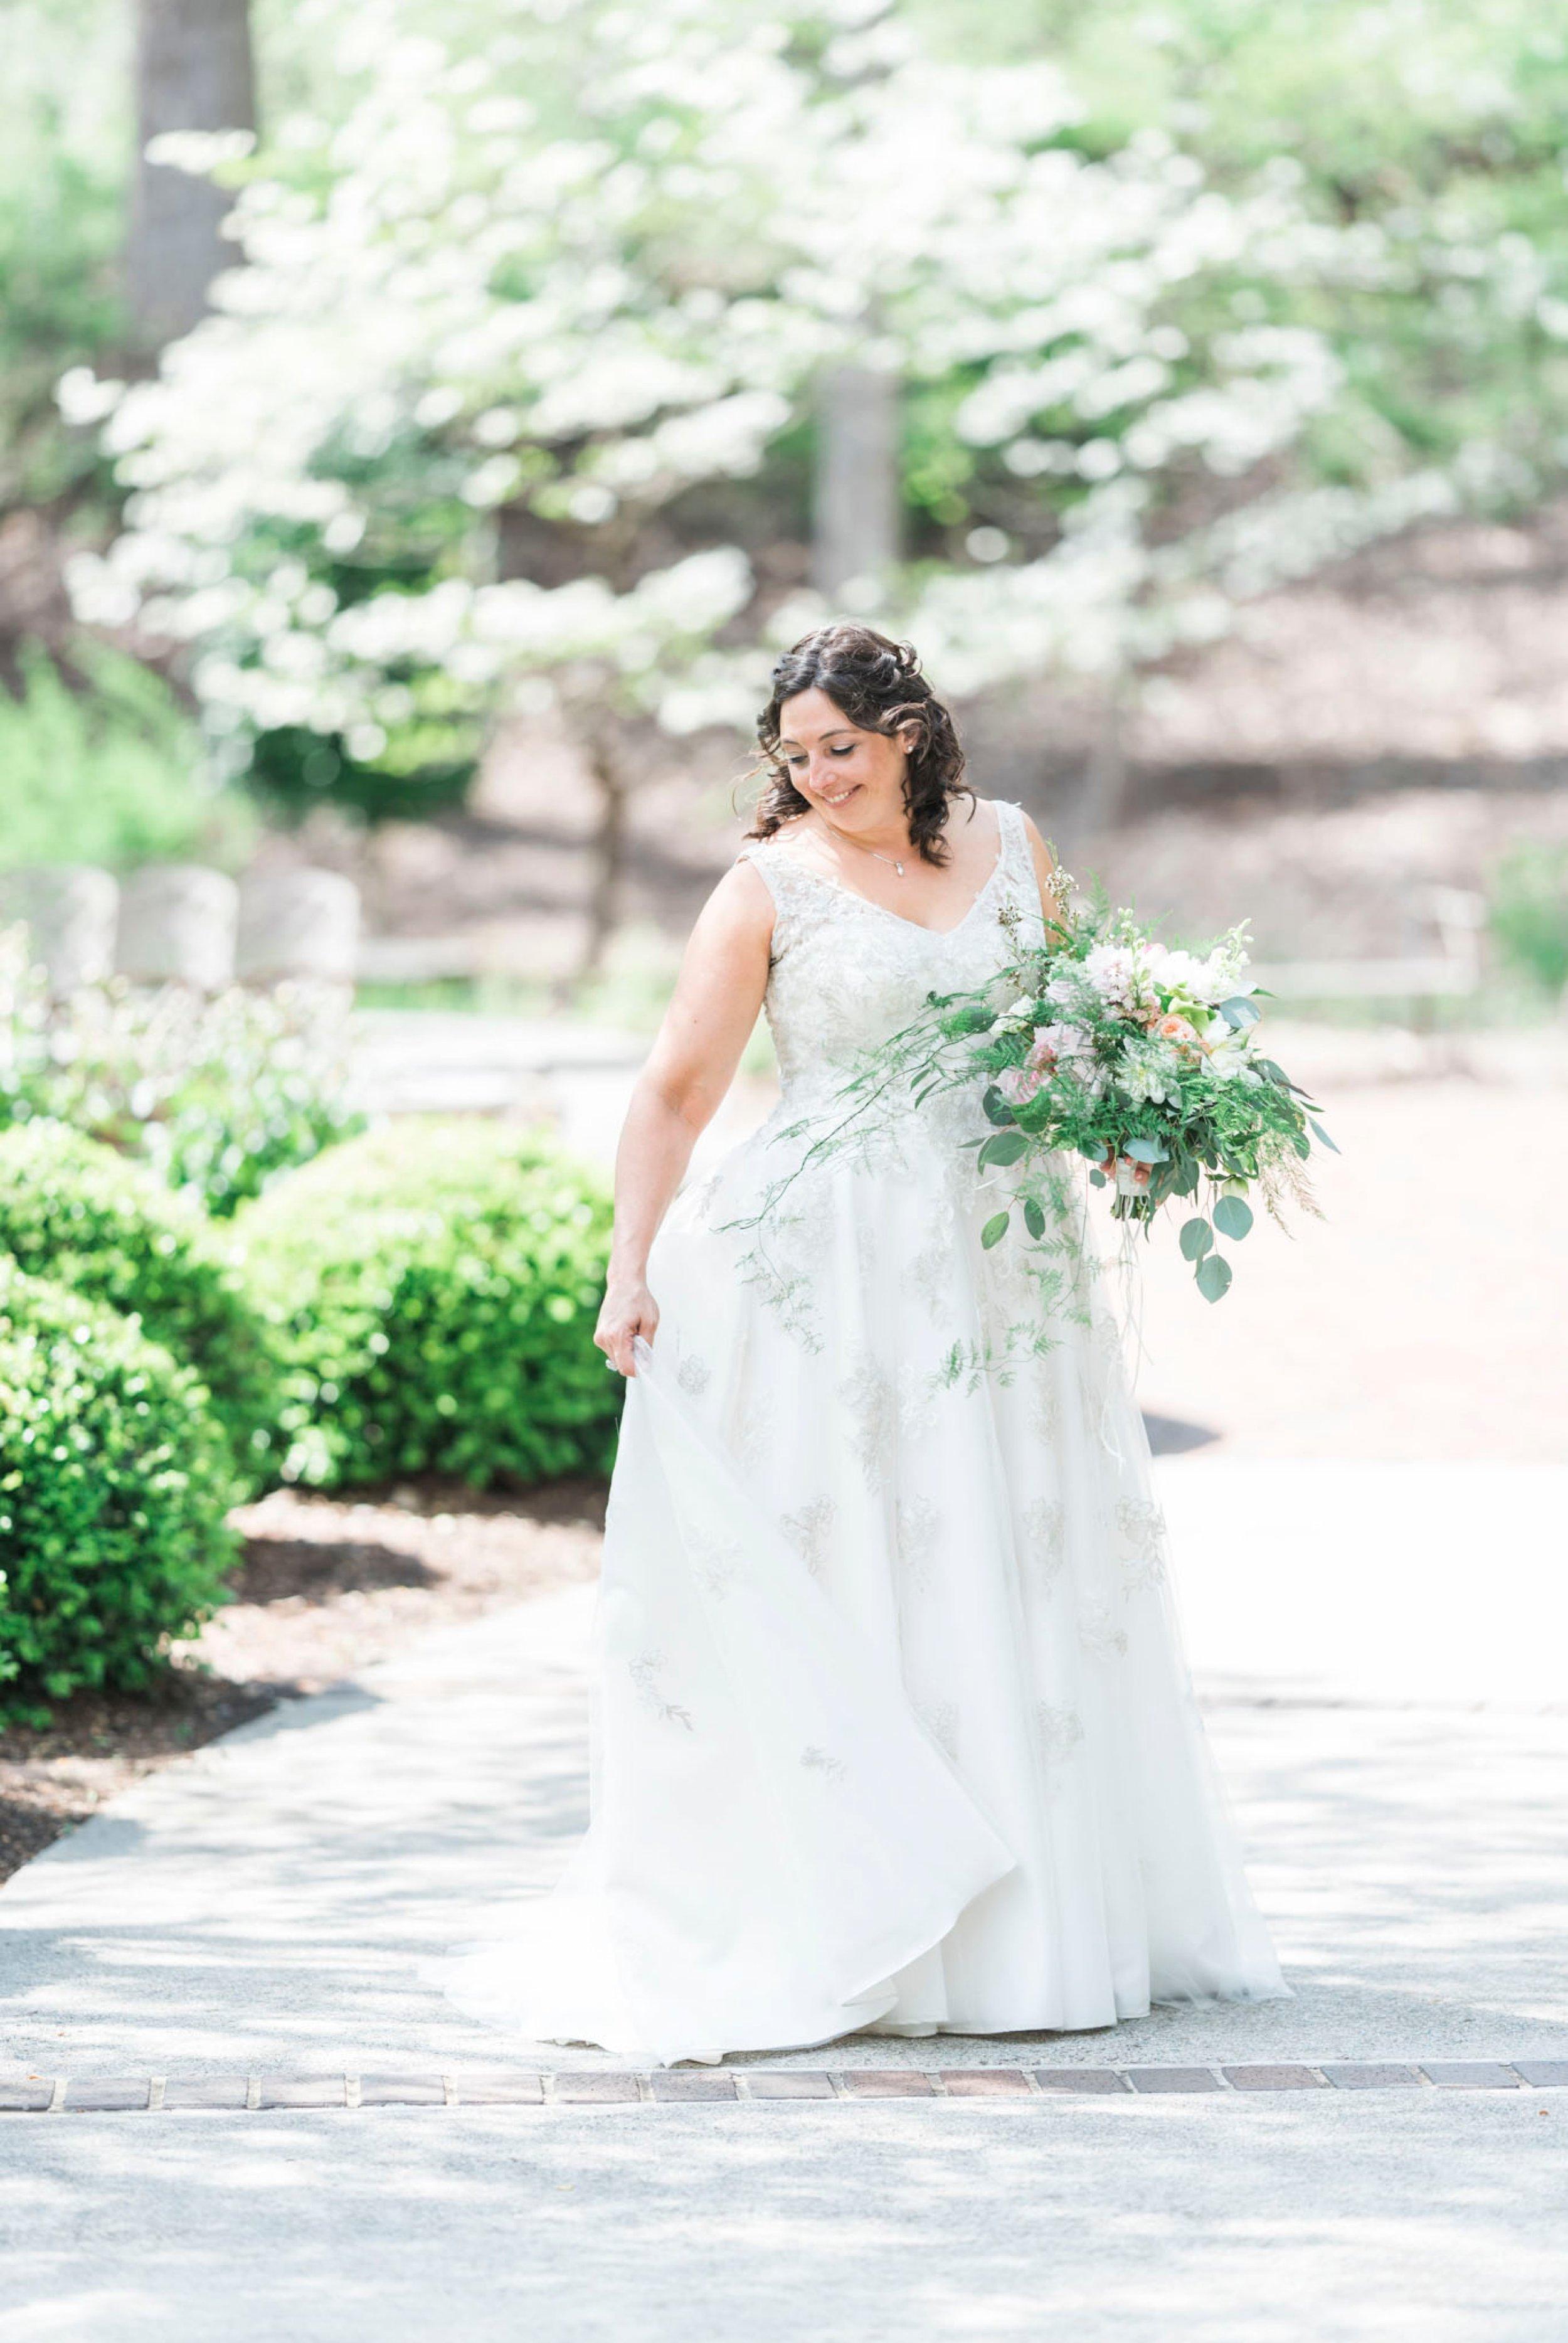 TheVirginianHotel_LynchburgVA_TheVirginianHotelWedding_Virginiaweddingphotographer_Lynchburgvawedding 29.jpg